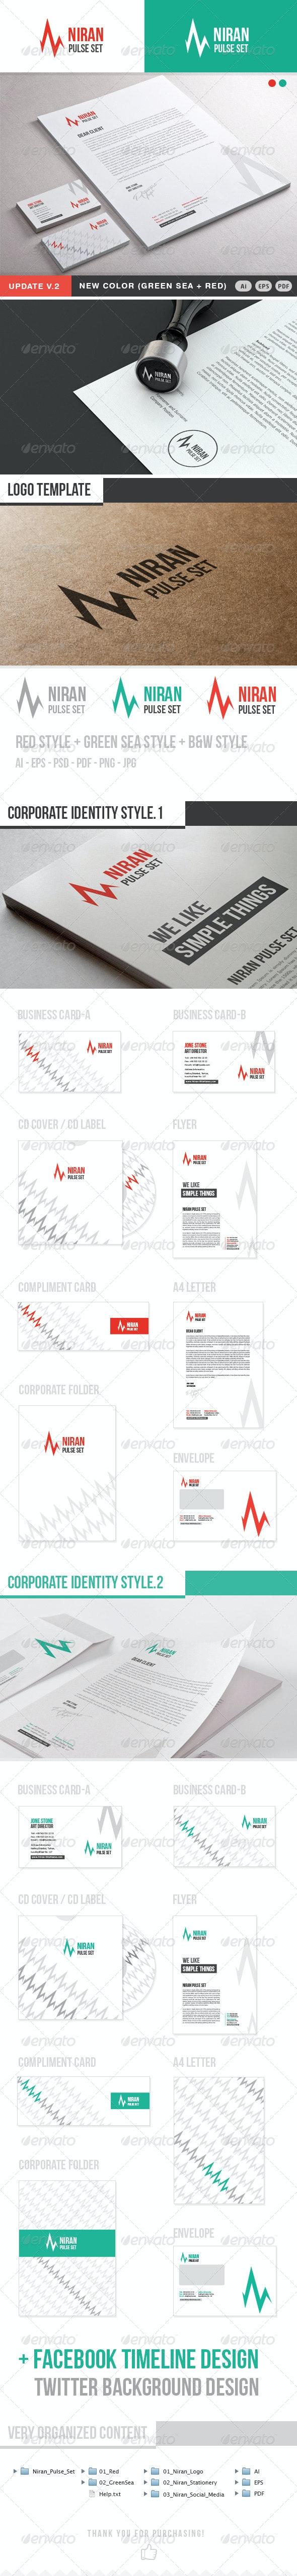 Niran Pulse Stationery - Stationery Print Templates